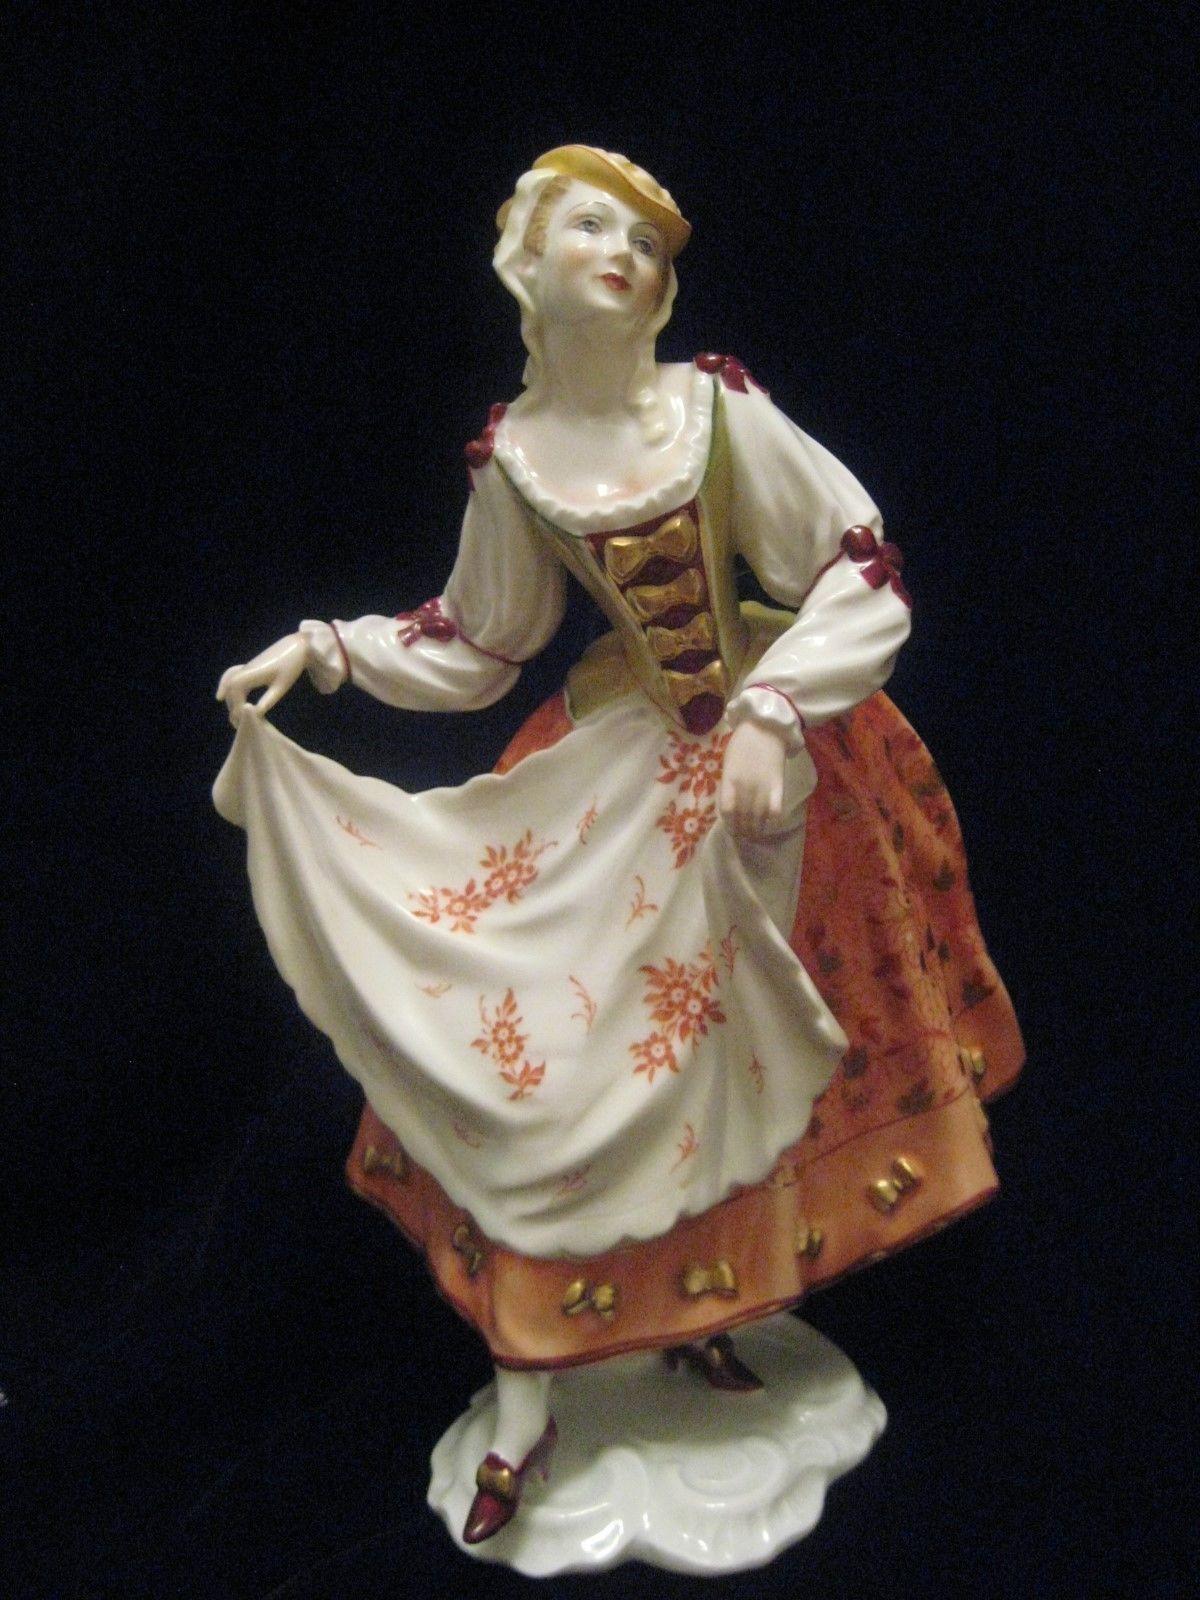 rosenthal vase ebay of vintage rosenthal porcelain woman dancing figurine gustav opel for dancing lady made in germany no chips cracks repairs or ebay